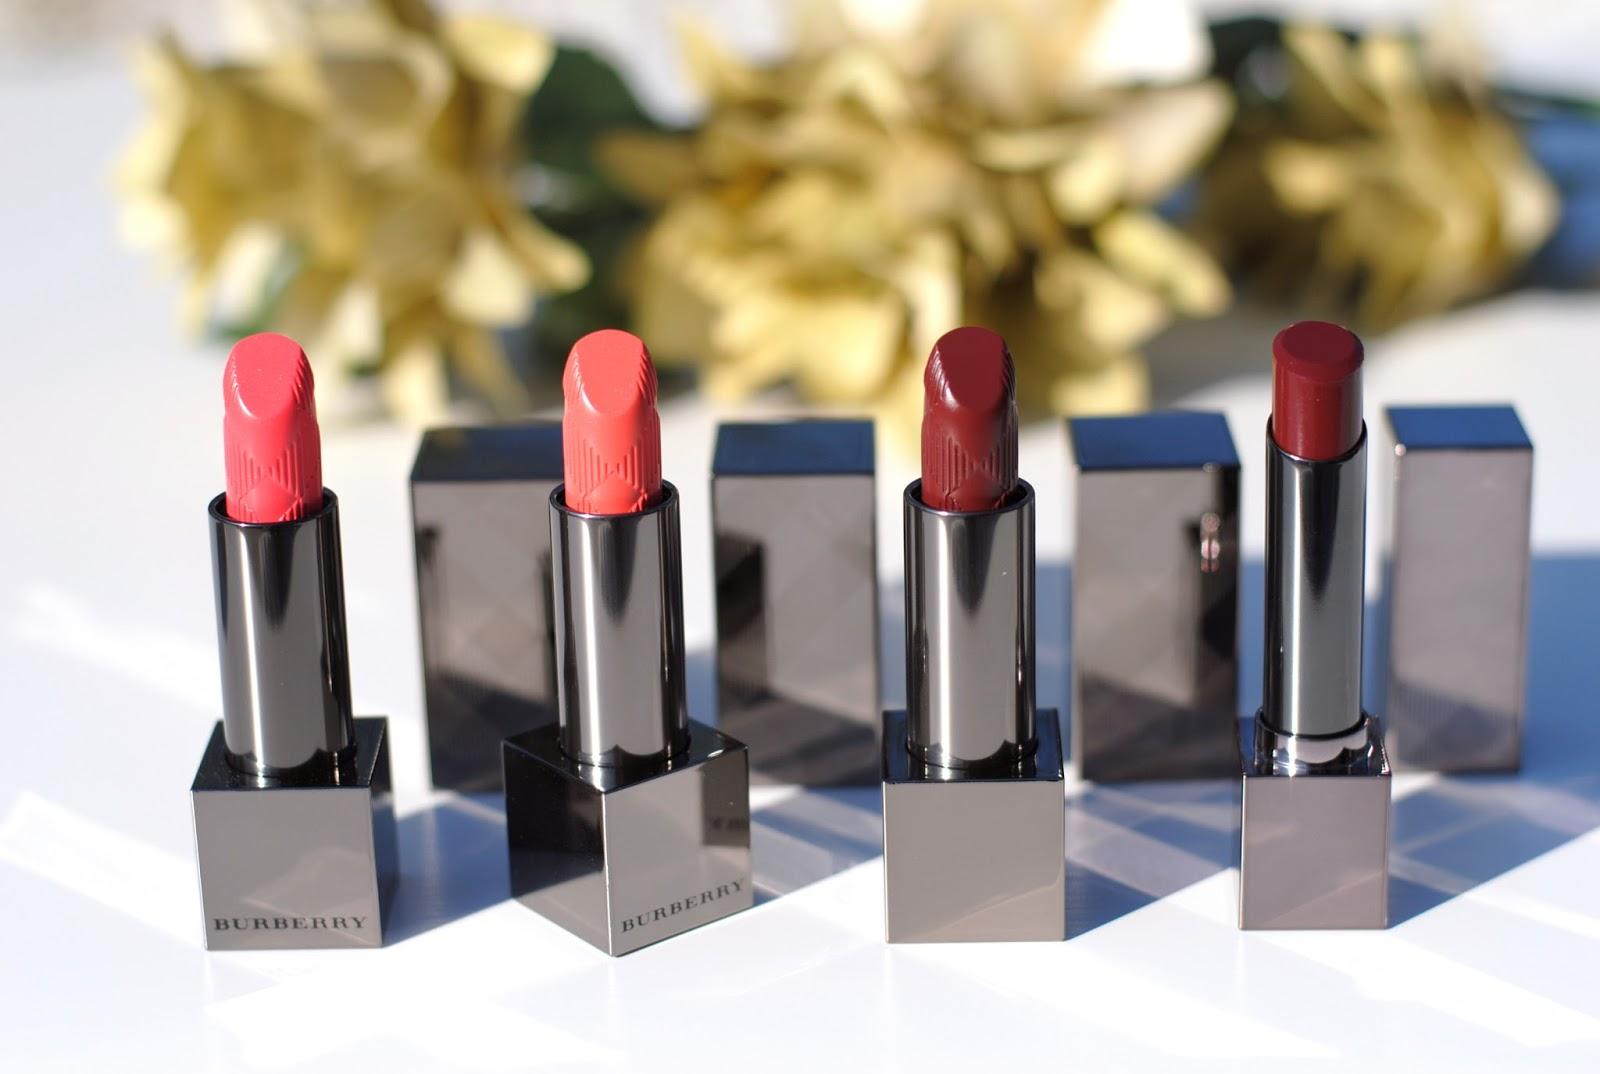 burberry kisses lipstick review